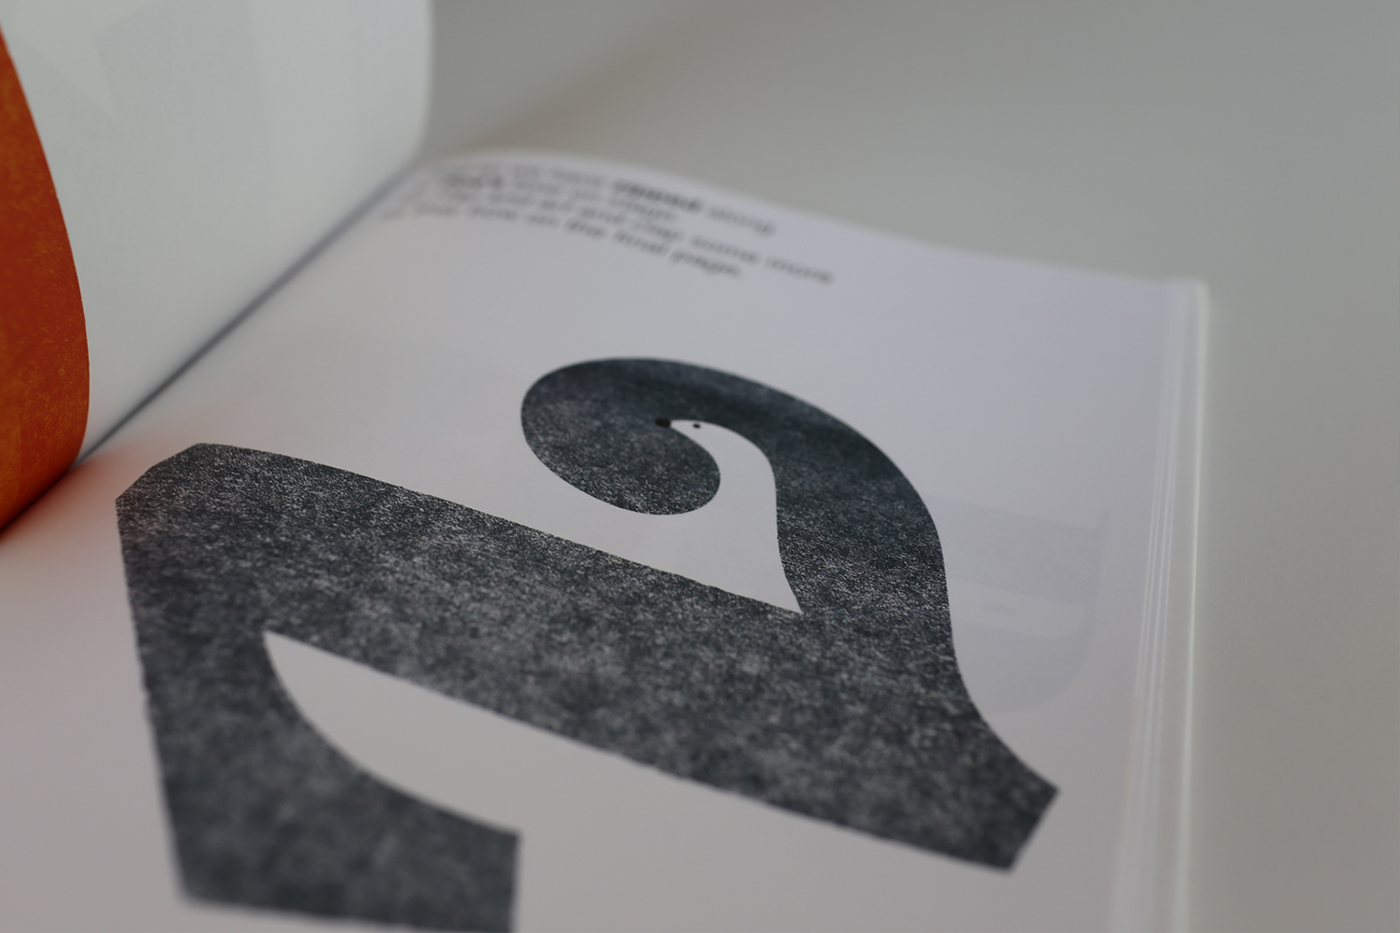 typefaces font letterpress print poster tee t-shirt tshirt editorial childrens kids CHILDS negativespace hidden